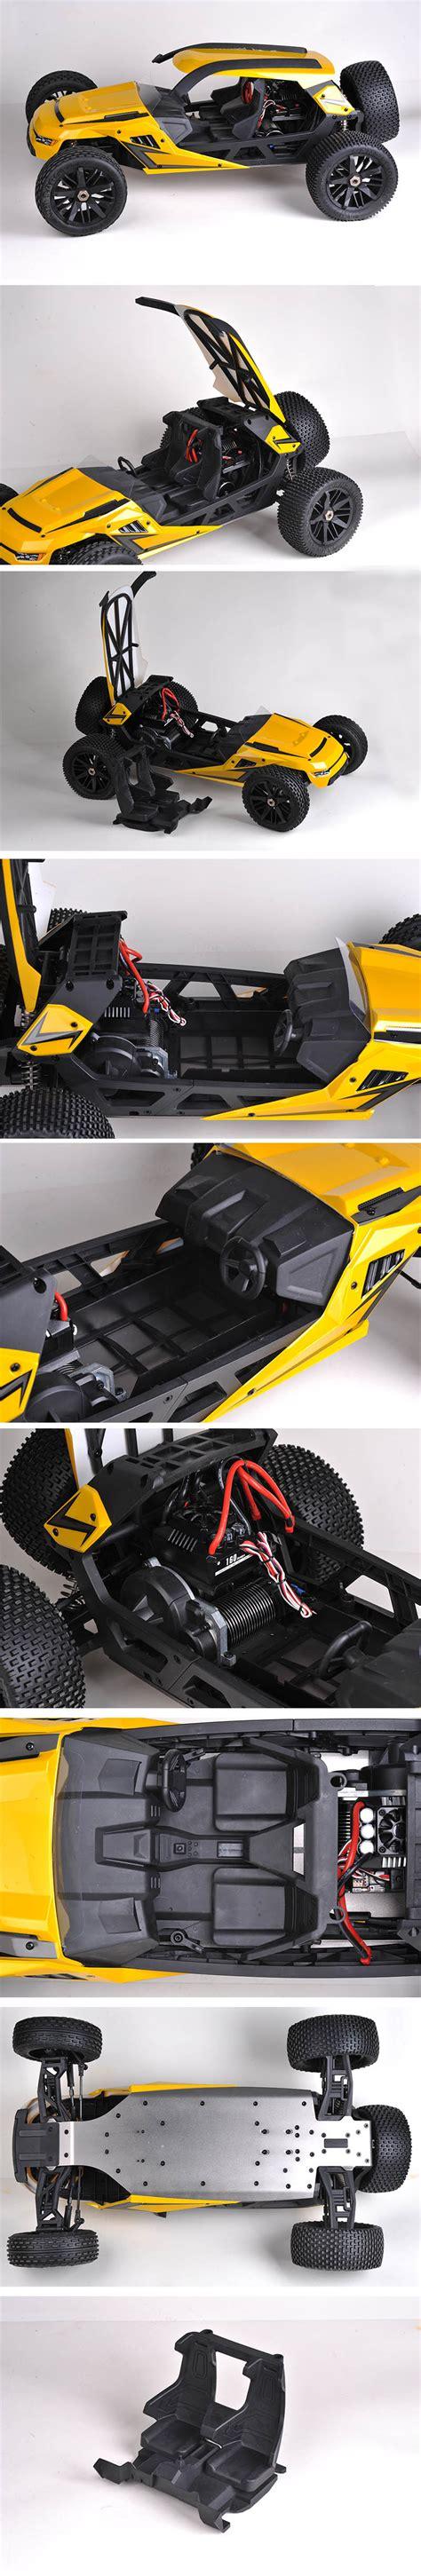 dc hbx hbx t6 1 6 70km h rwd proportional brushless rc desert buggy rc racing car price 449 99 euro